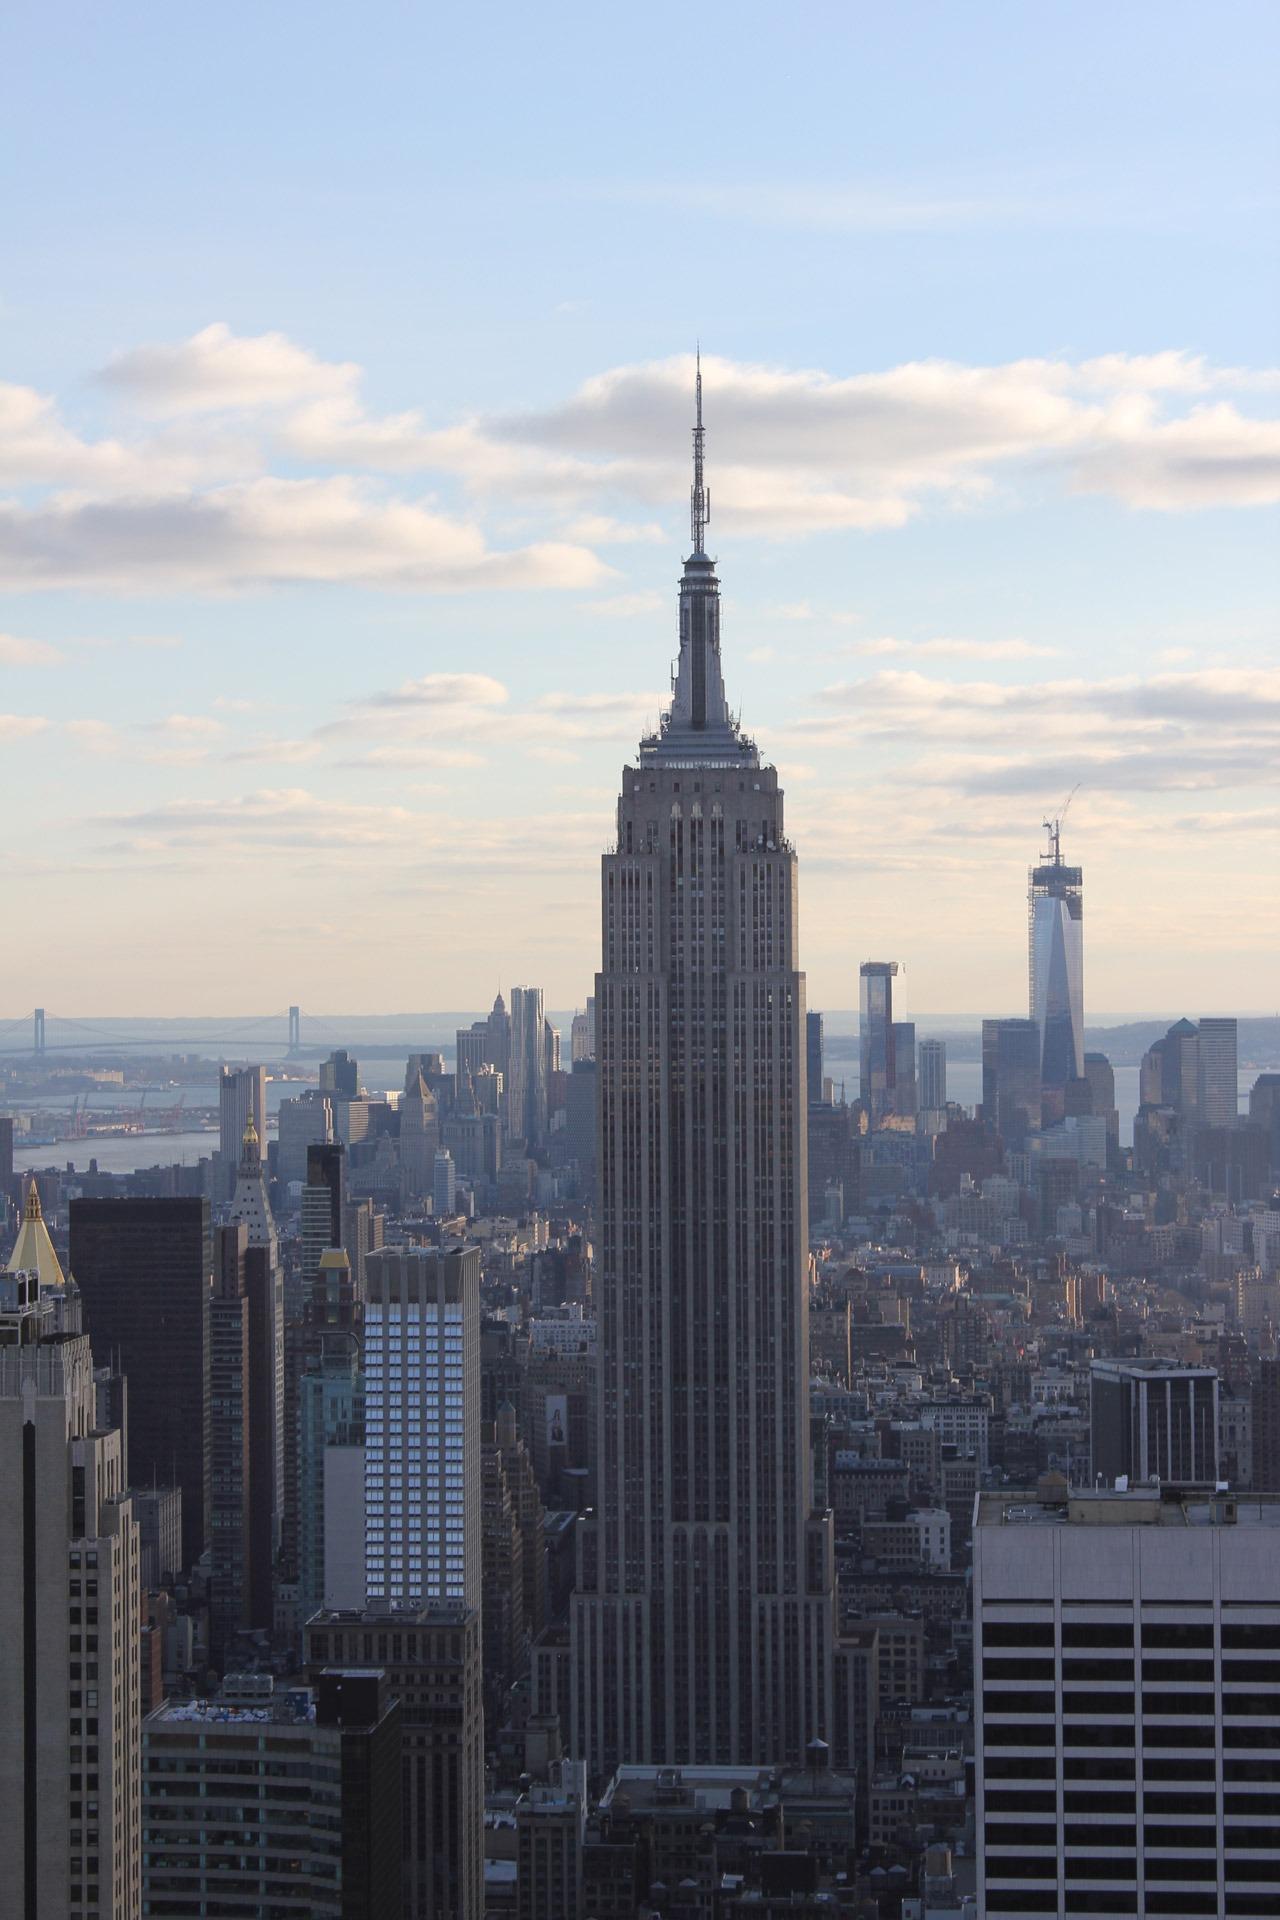 free images horizon skyline skyscraper new york manhattan new york city cityscape. Black Bedroom Furniture Sets. Home Design Ideas